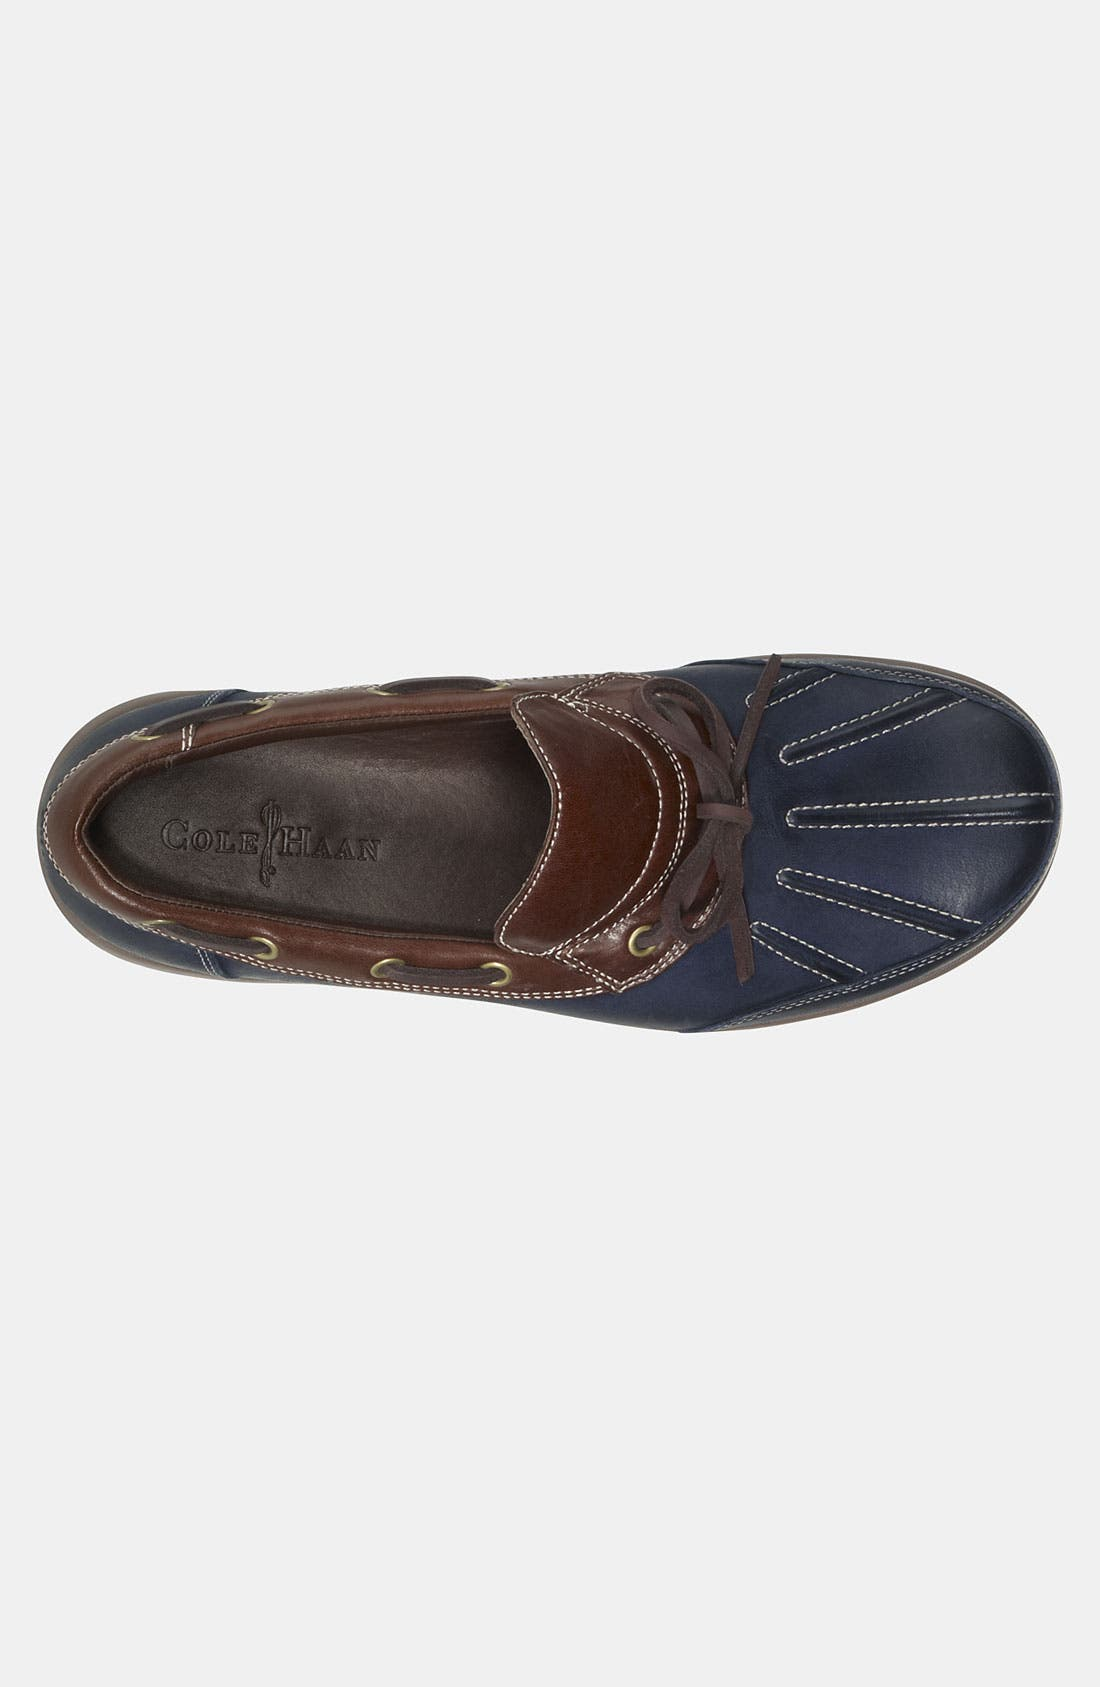 Alternate Image 3  - Cole Haan 'Air Rhone' Camp Boat Shoe